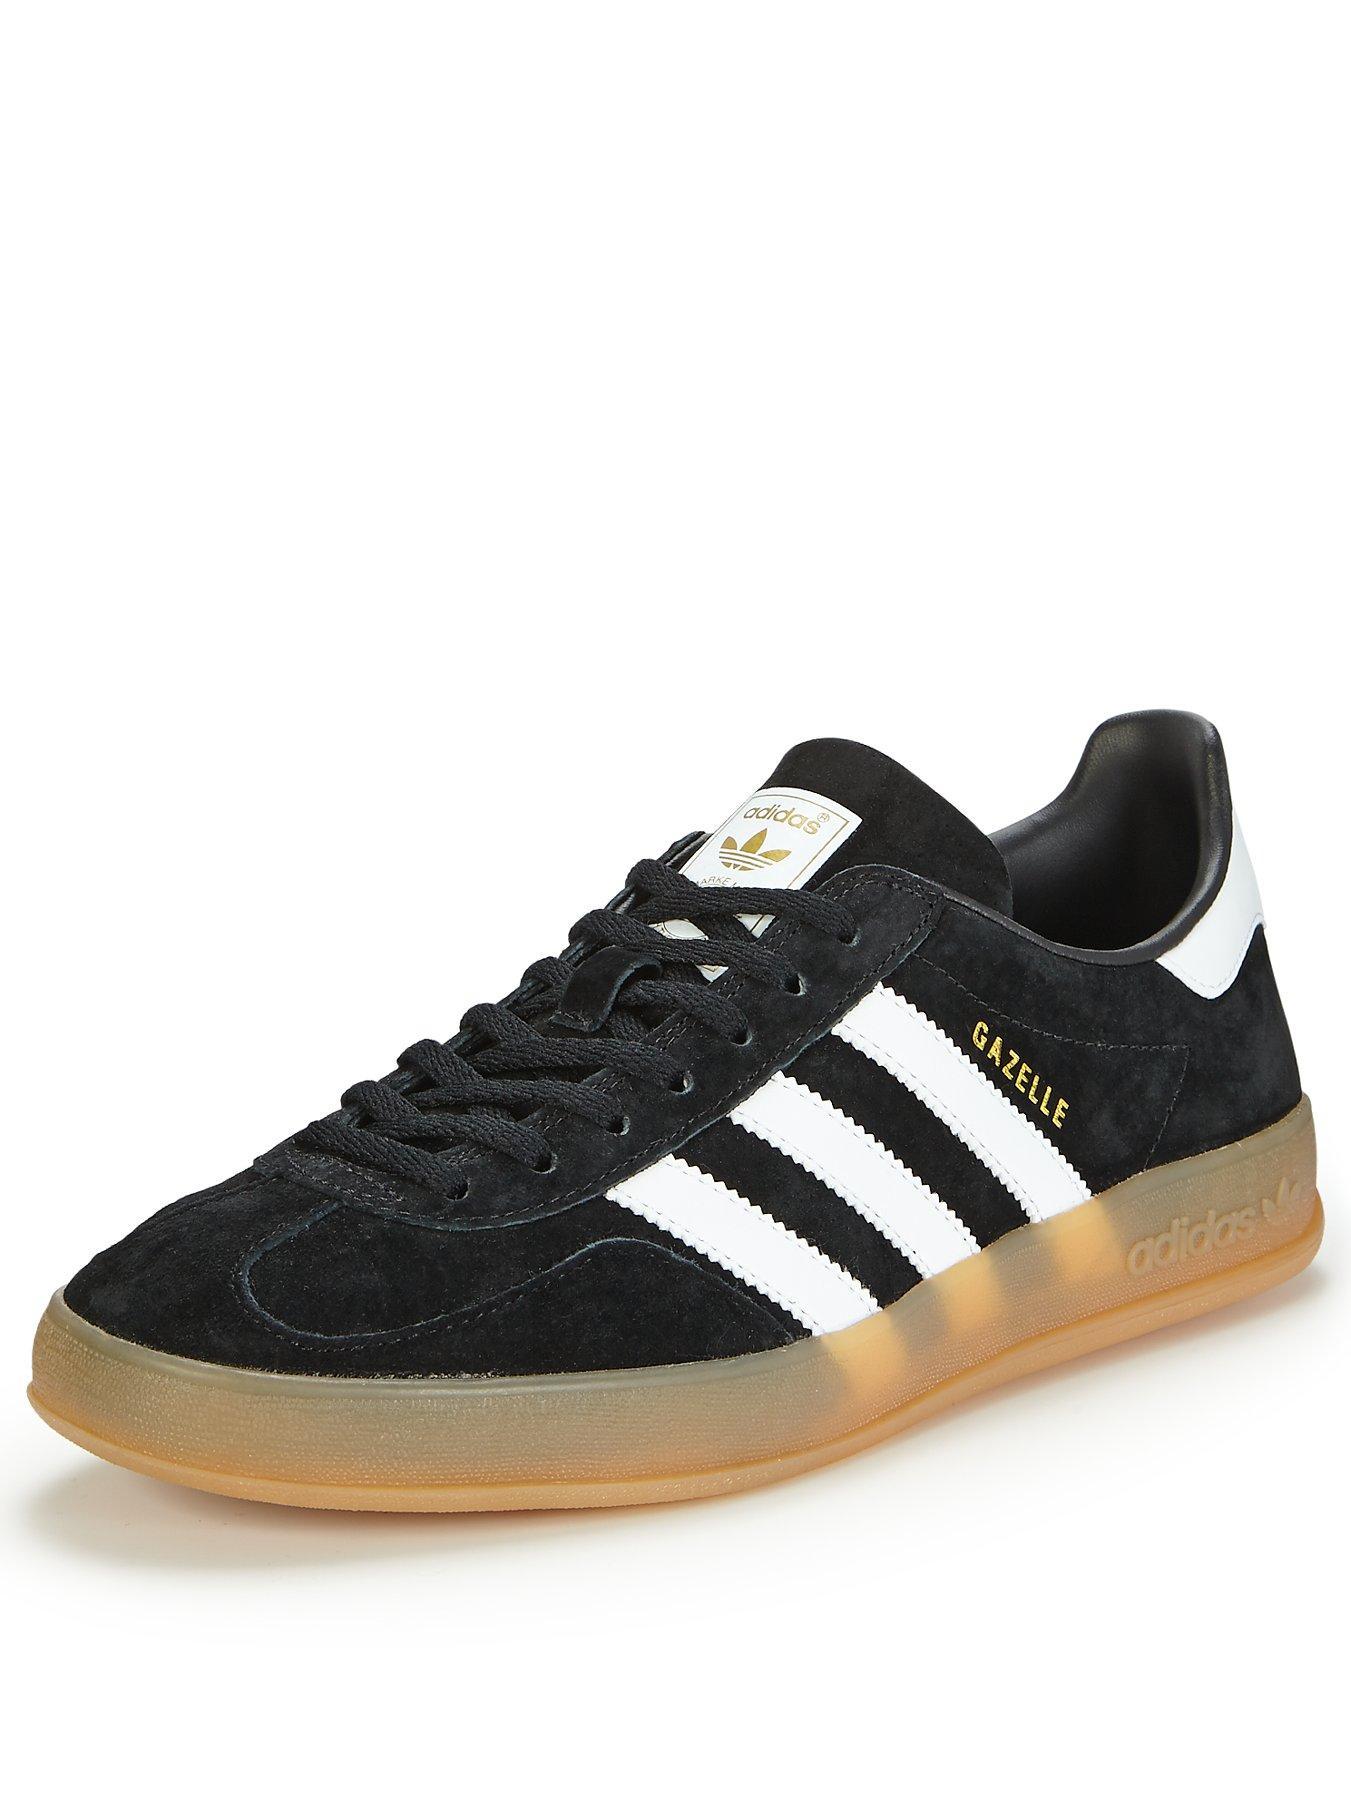 Adidas Originals Gazelle Indoor Trainers Grey